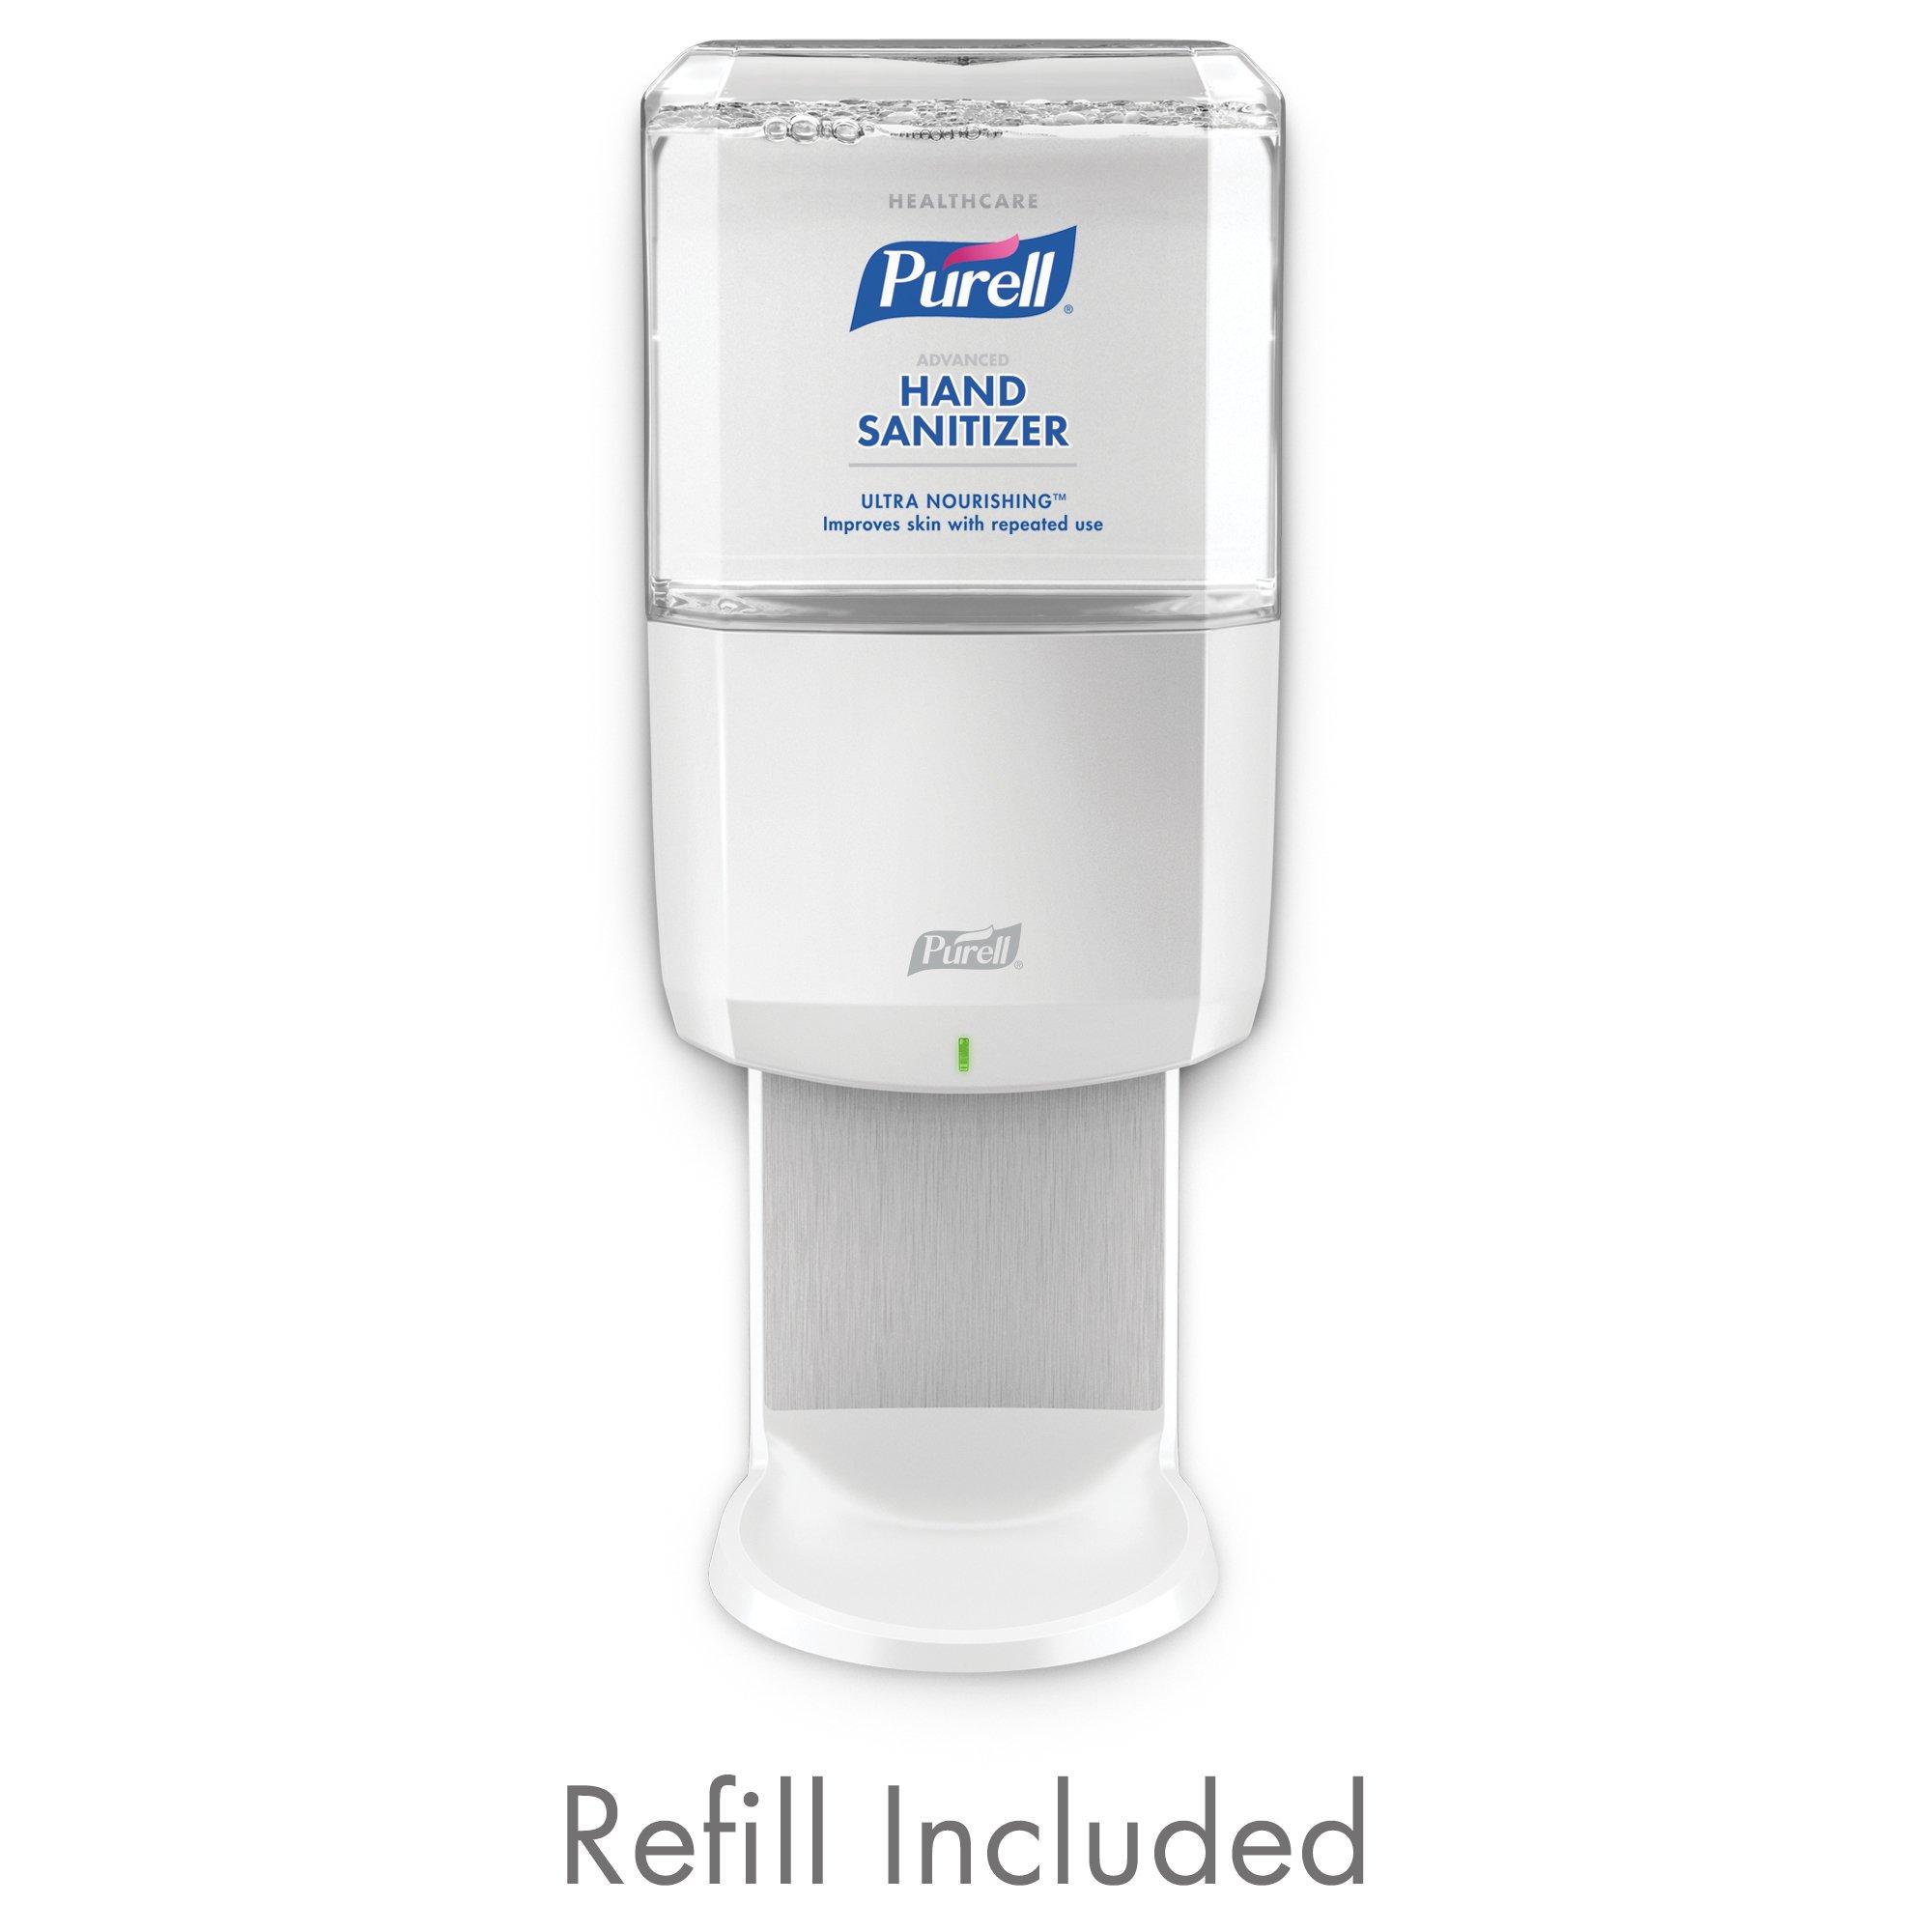 PURELL Healthcare Advanced Hand Sanitizer ULTRA NOURISHING Foam ES6 Starter Kit, 1 - 1200 mL EcoLogo Certified Sanitizer Refill + 1 - PURELL ES6 White Touch-Free Dispenser - 6456-1W by Purell